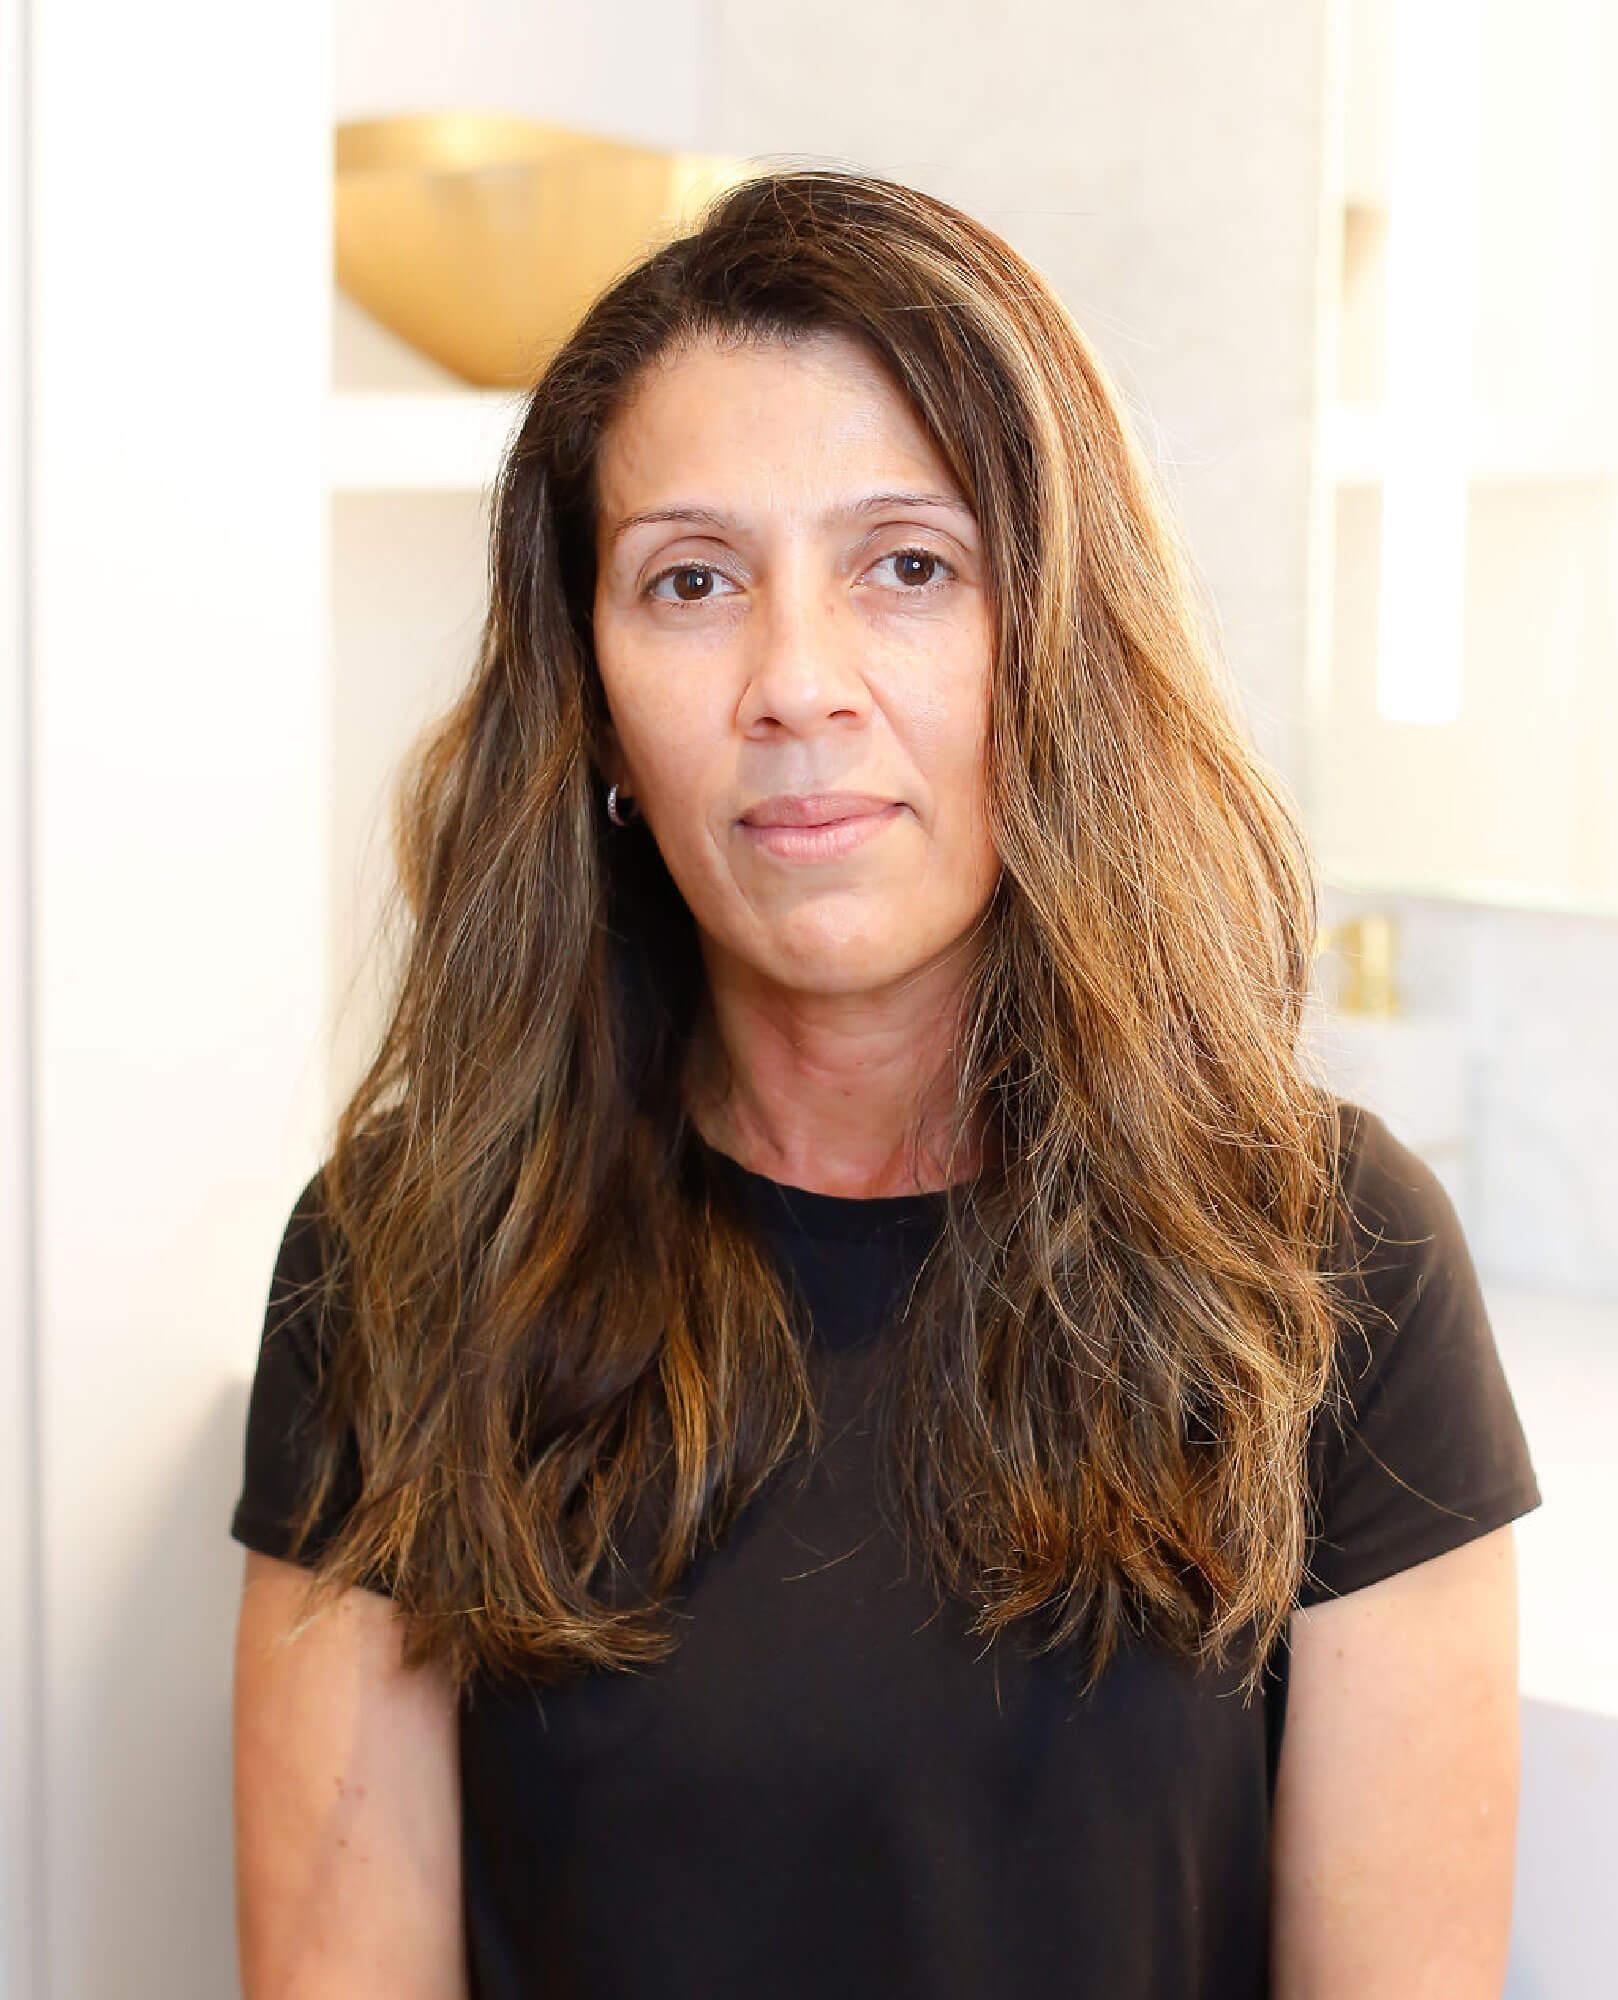 Sussie Araya Emerge staff photo